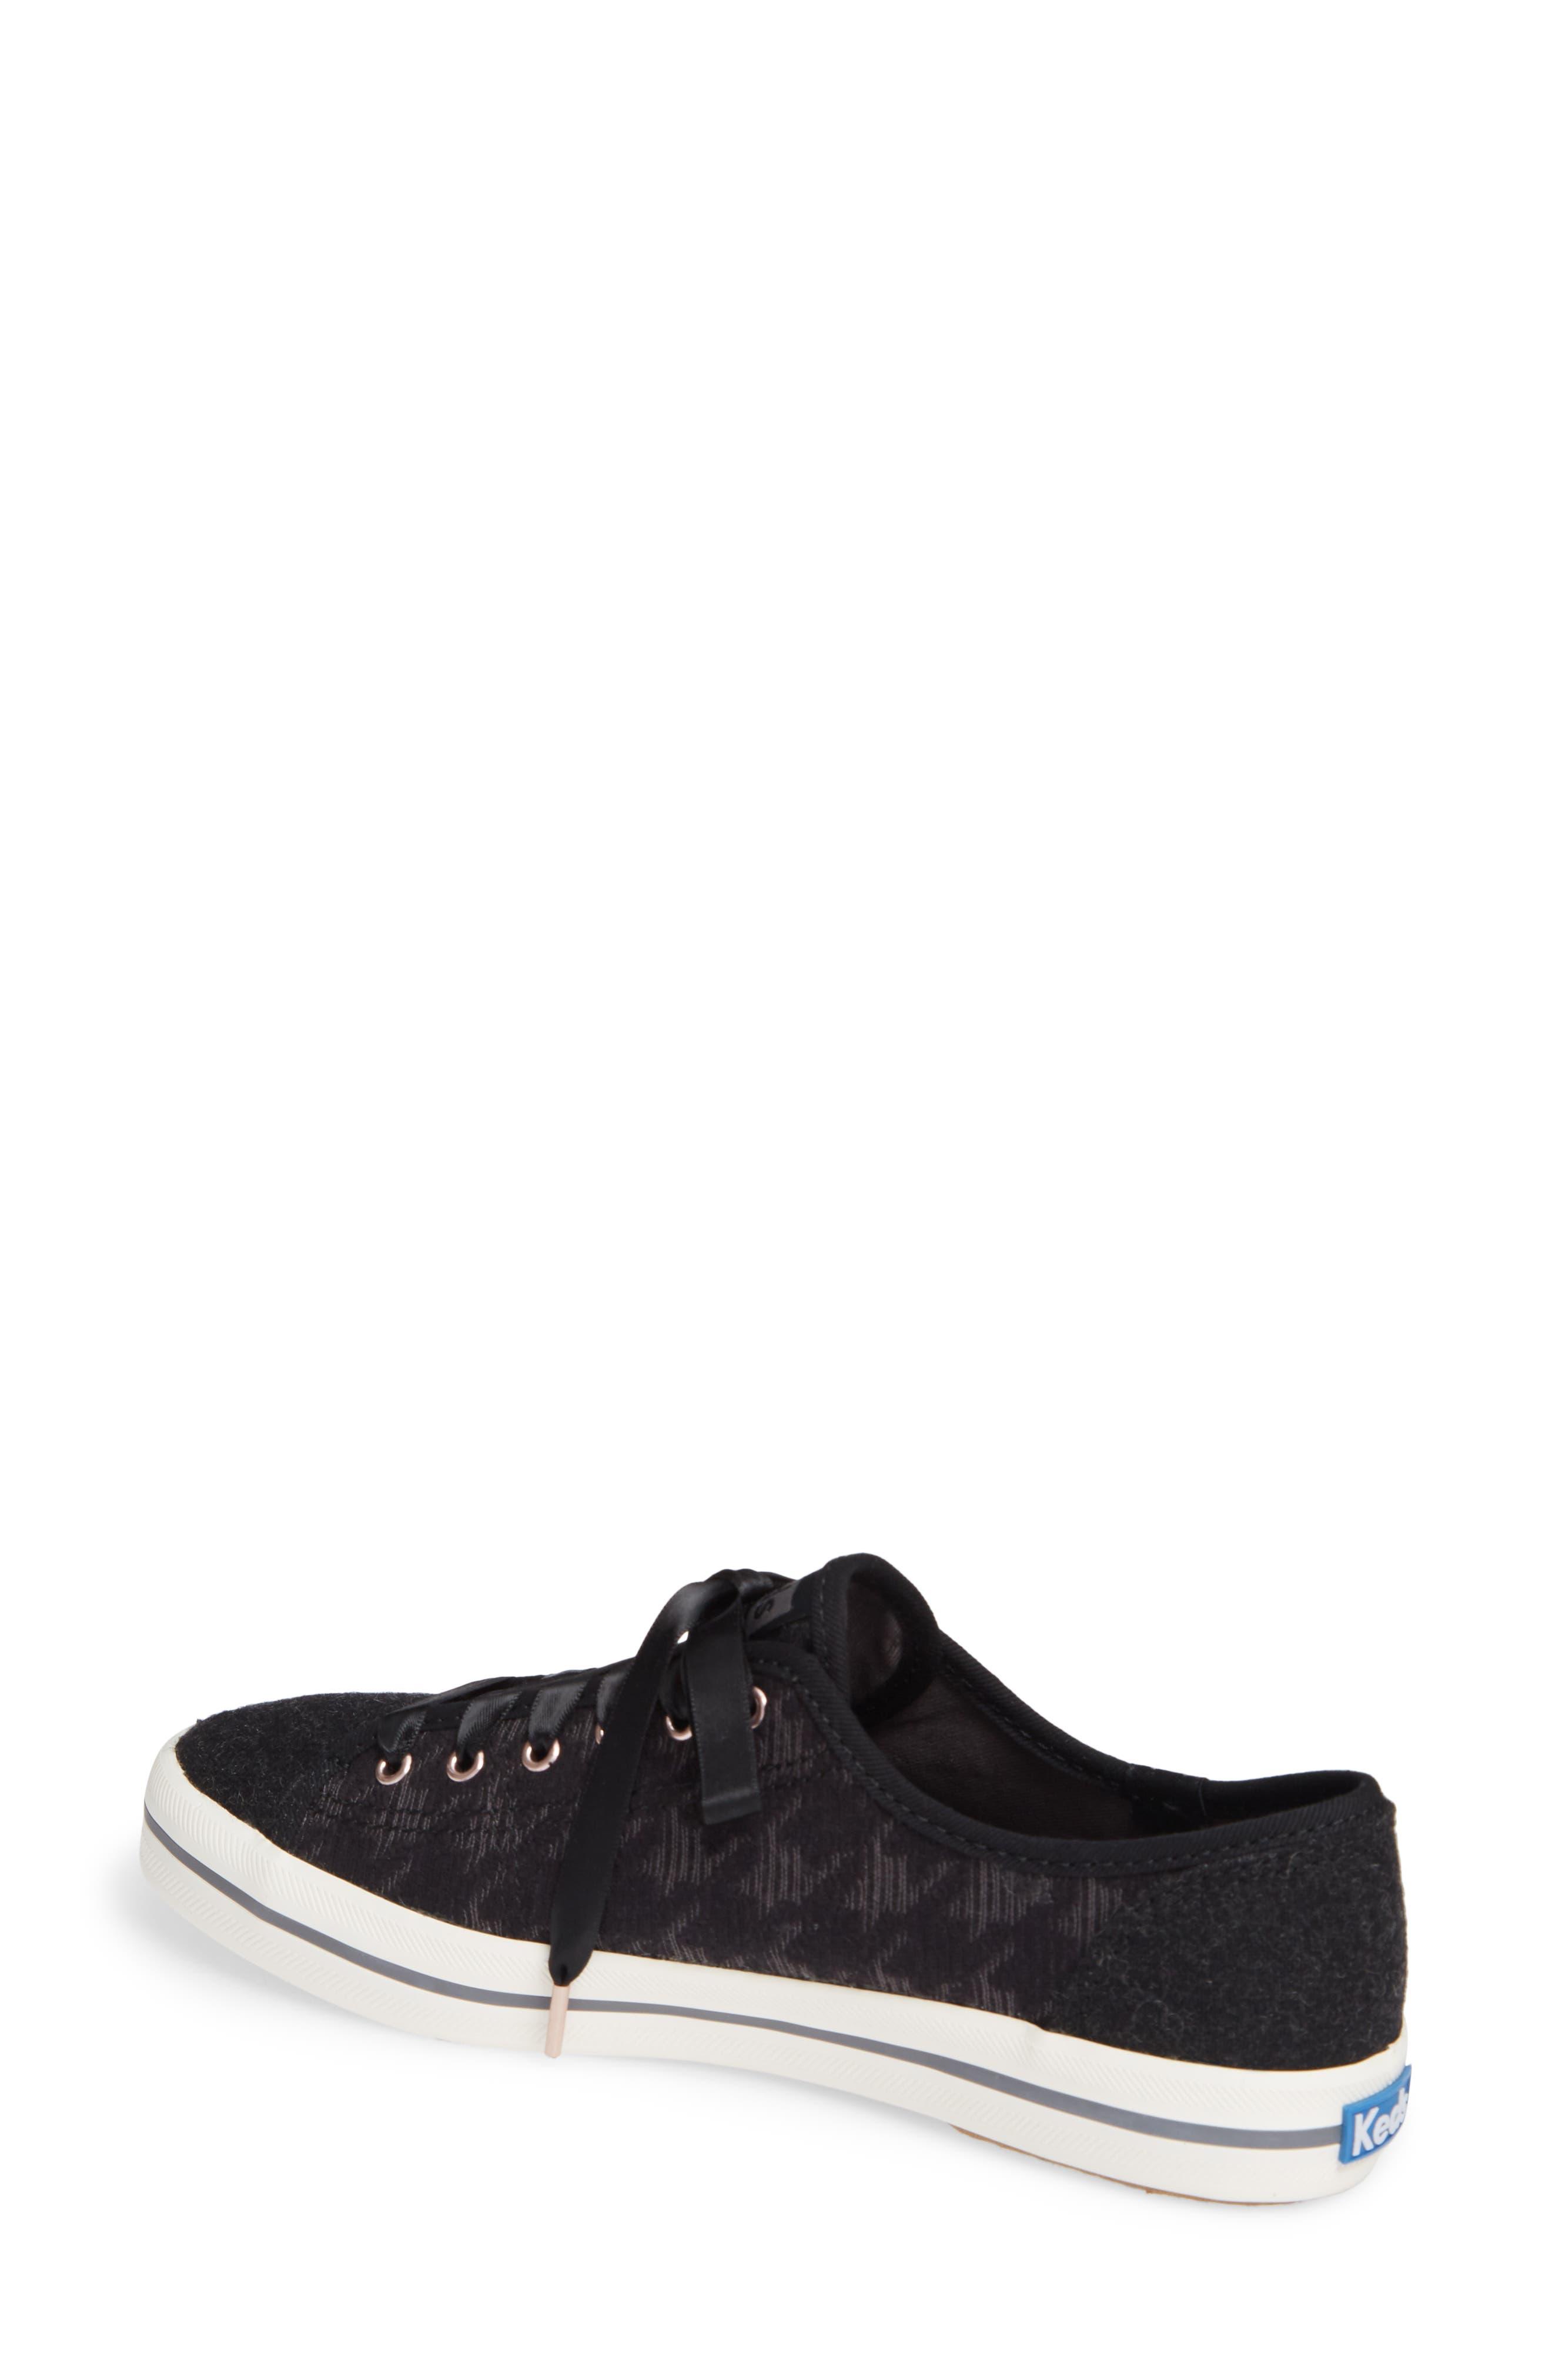 KEDS<SUP>®</SUP>, Kickstart Sneaker, Alternate thumbnail 2, color, BLACK HOUNDSTOOTH